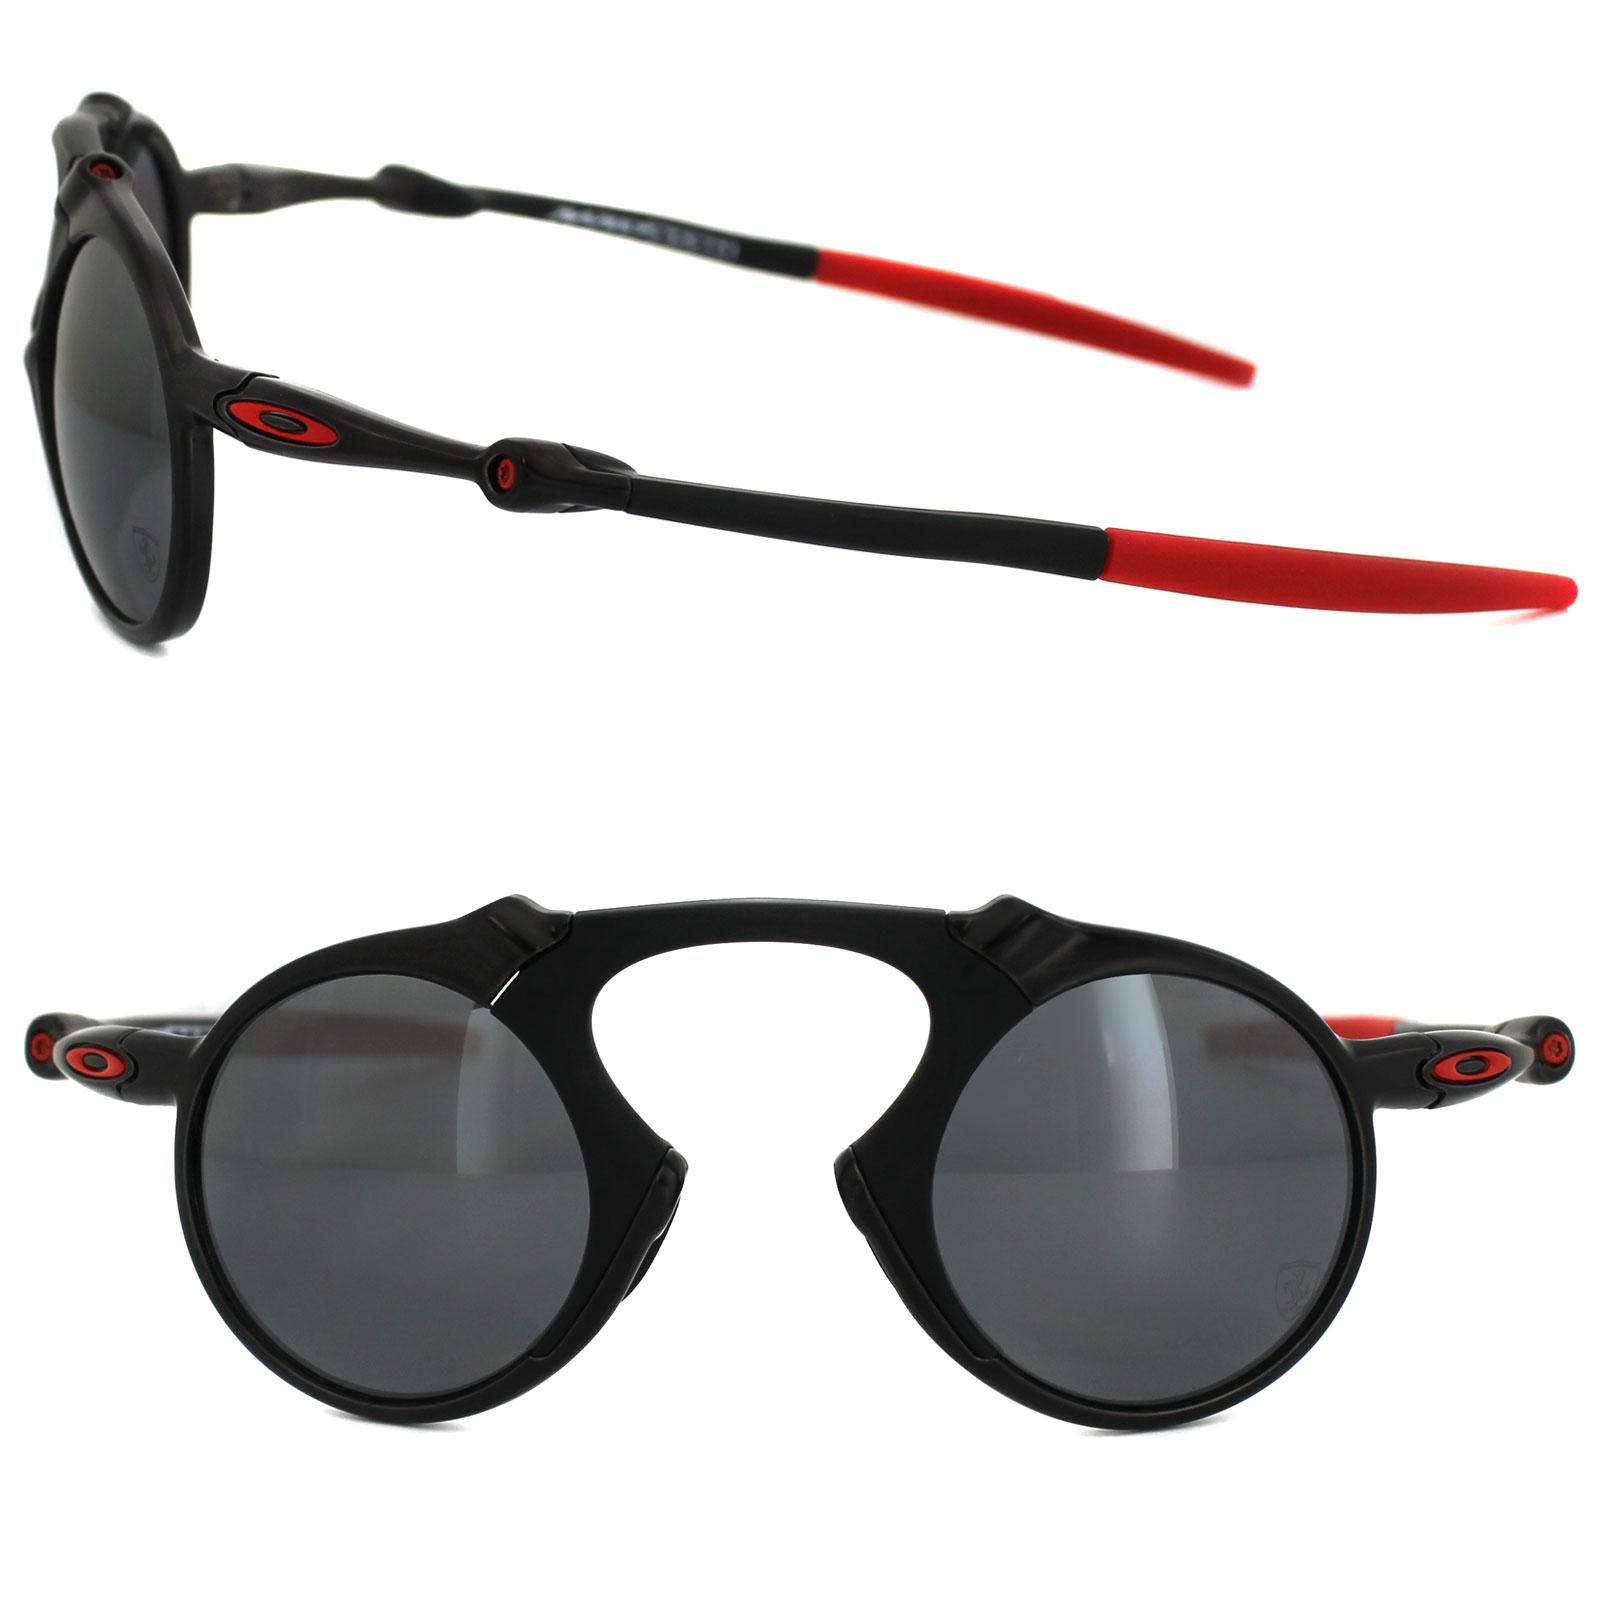 20f1d6bab67 ... reduced oakley madman sunglasses thumbnail 1 oakley madman sunglasses  thumbnail 2 0b110 34786